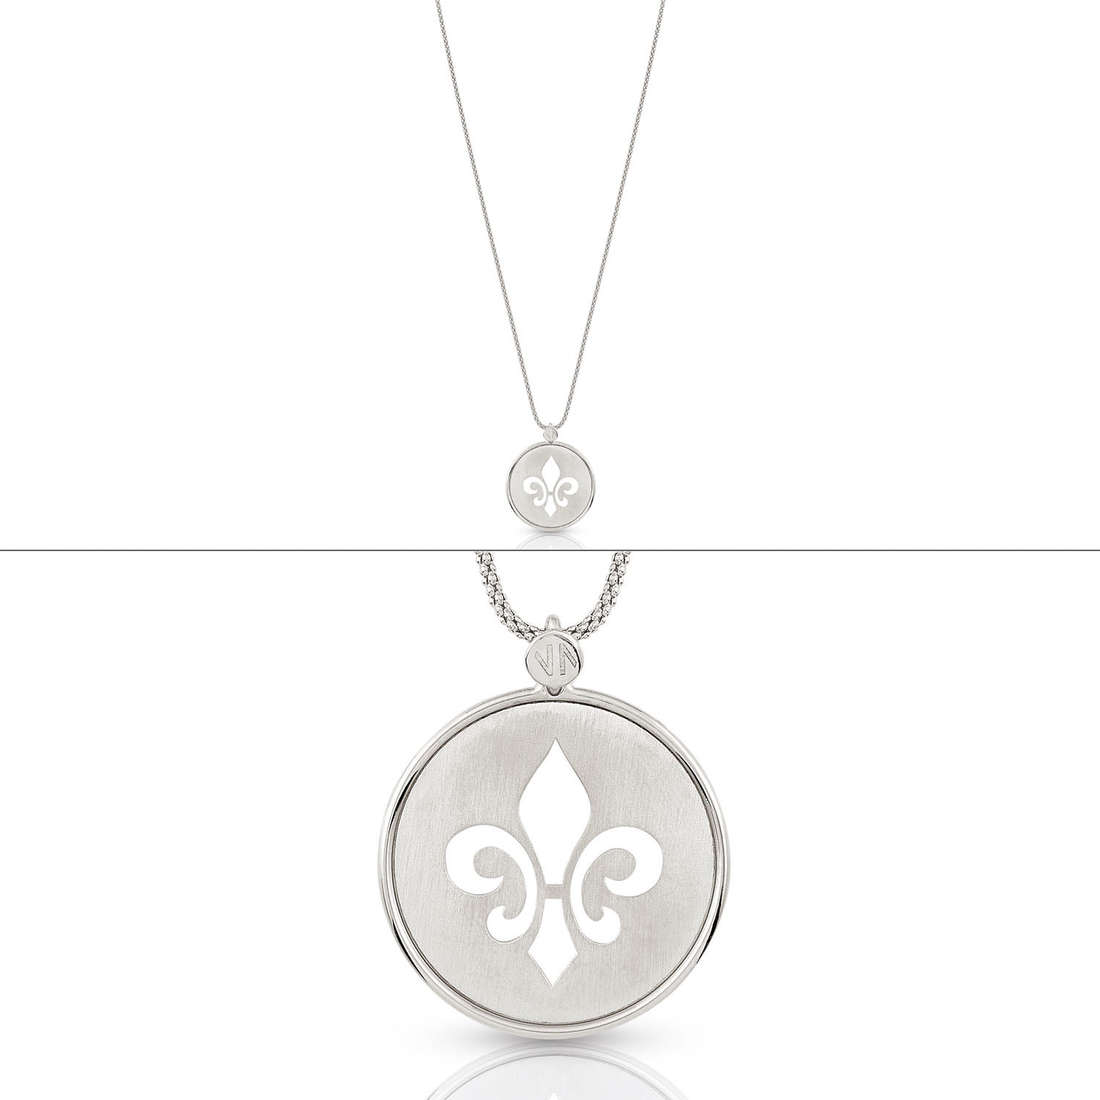 necklace unisex jewellery Nomination 145404/010